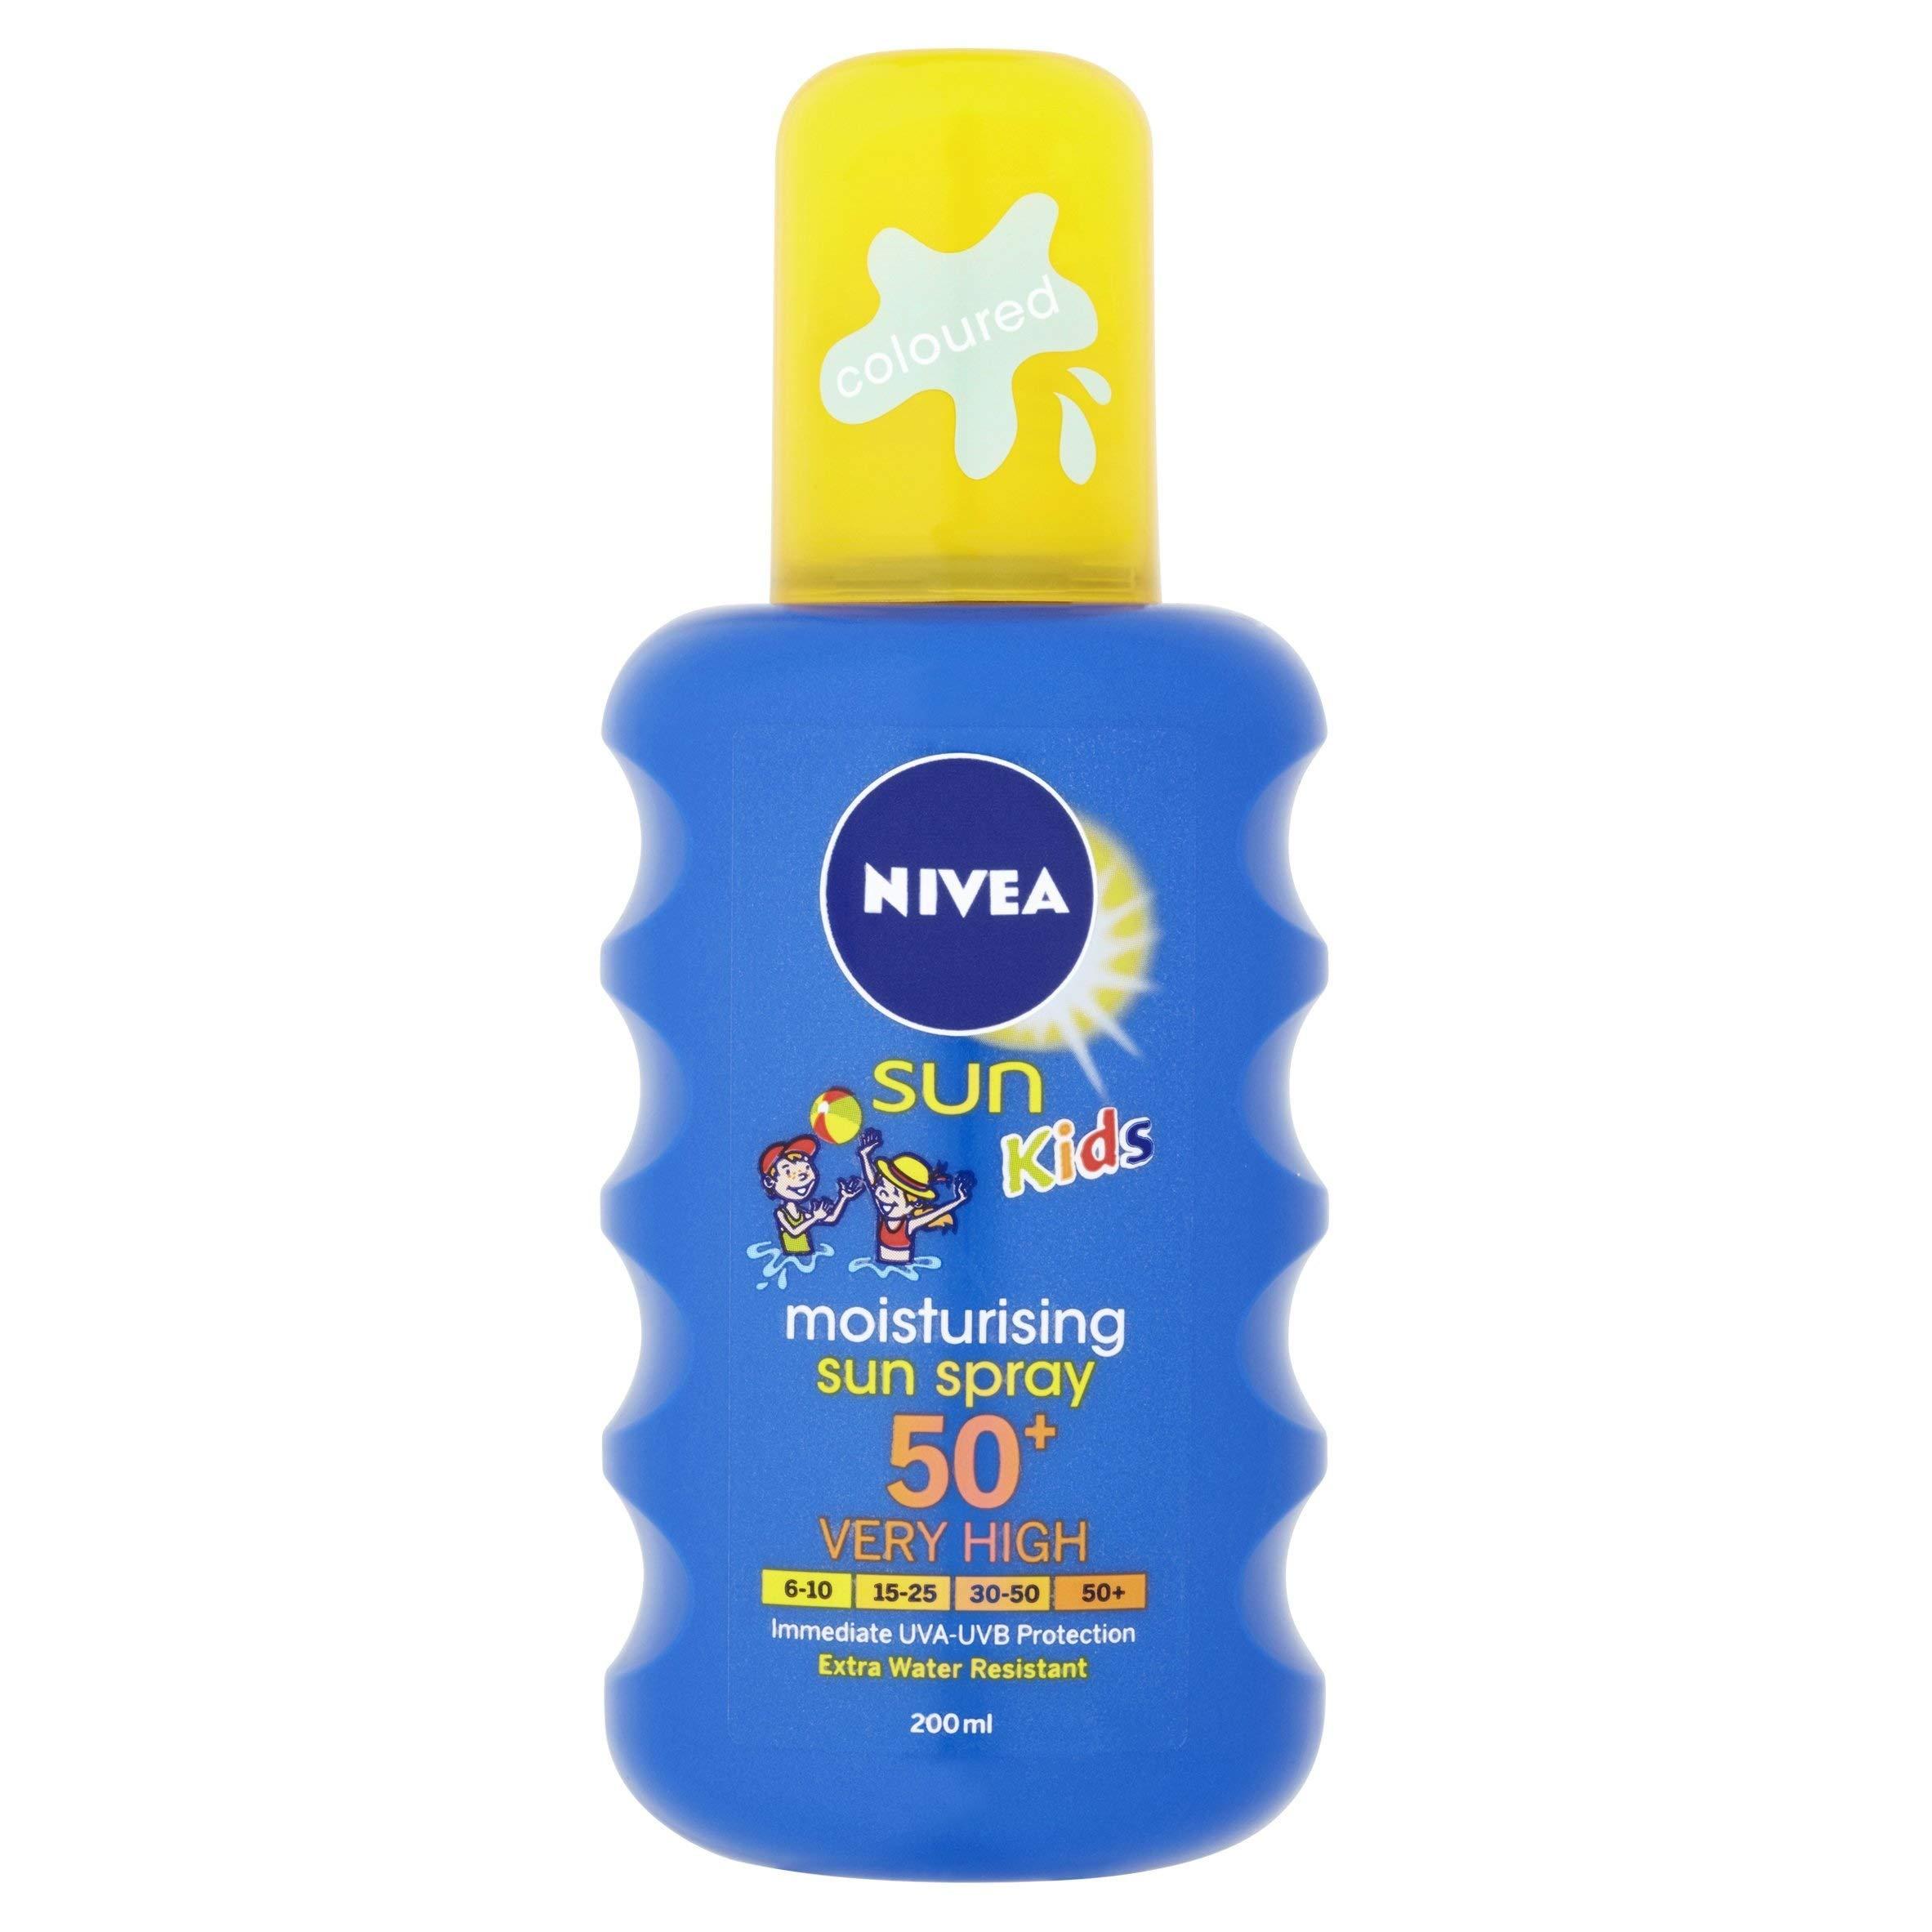 NIVEA SUN Kids Protect & Care Coloured Spray SPF 50+ (200 ml) Sunscreen Spray with SPF 50 Kids Suncream for Sensitive Skin, Immediately Protects Against Sun Exposure